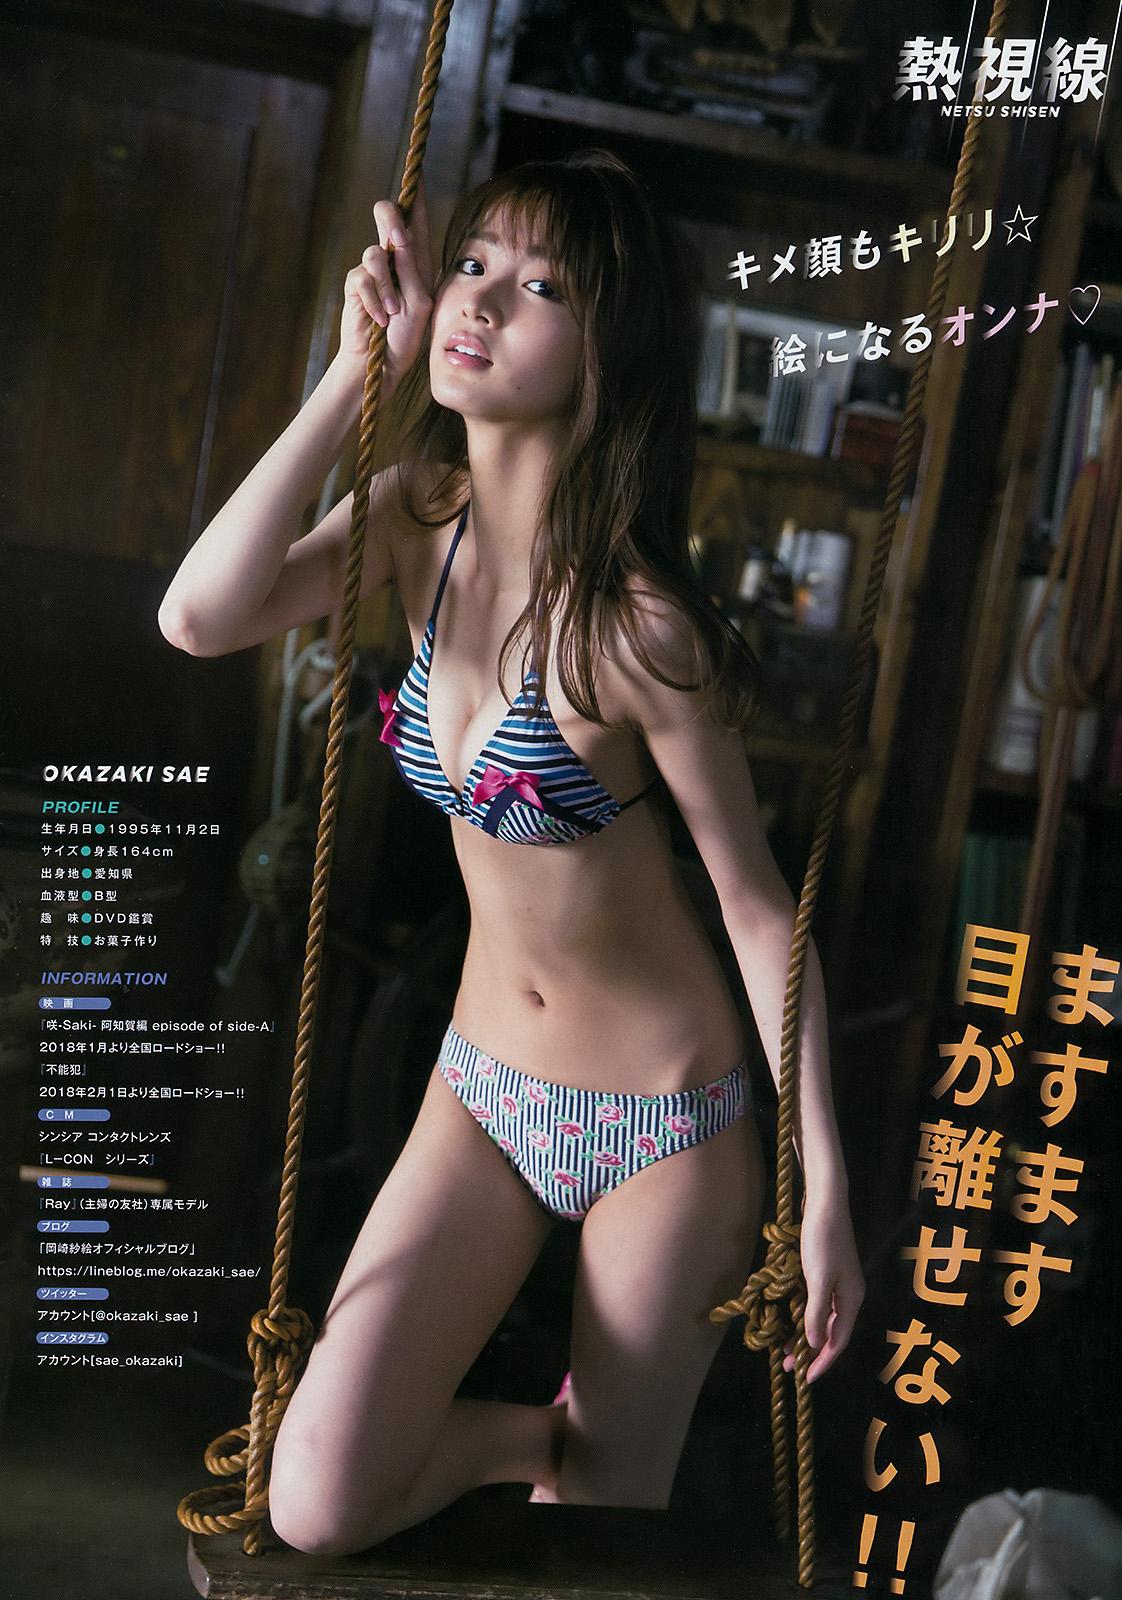 Sae Okazaki 岡崎紗絵, Young Magazine 2017 No.48 (週刊ヤングマガジン 2017年48号)